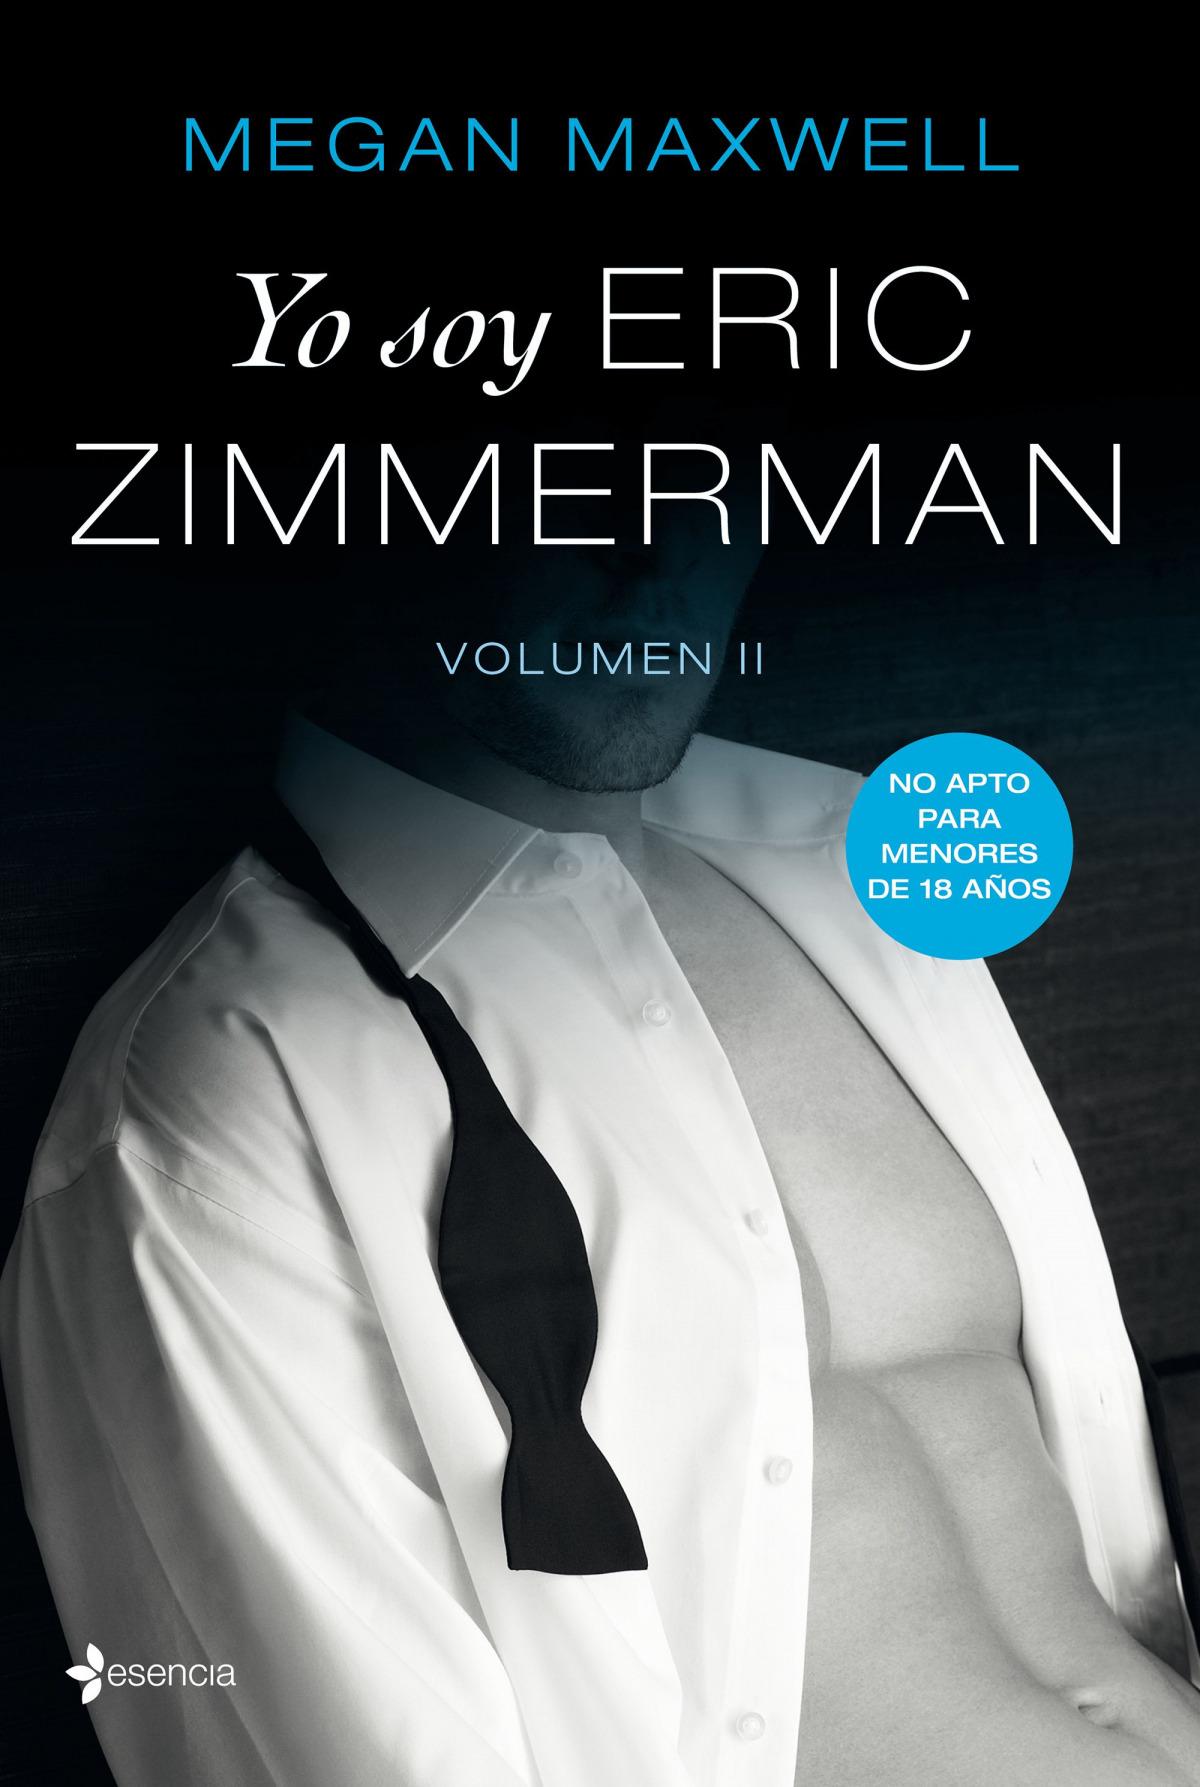 Yo soy Eric Zimmerman, vol II 9788408196211